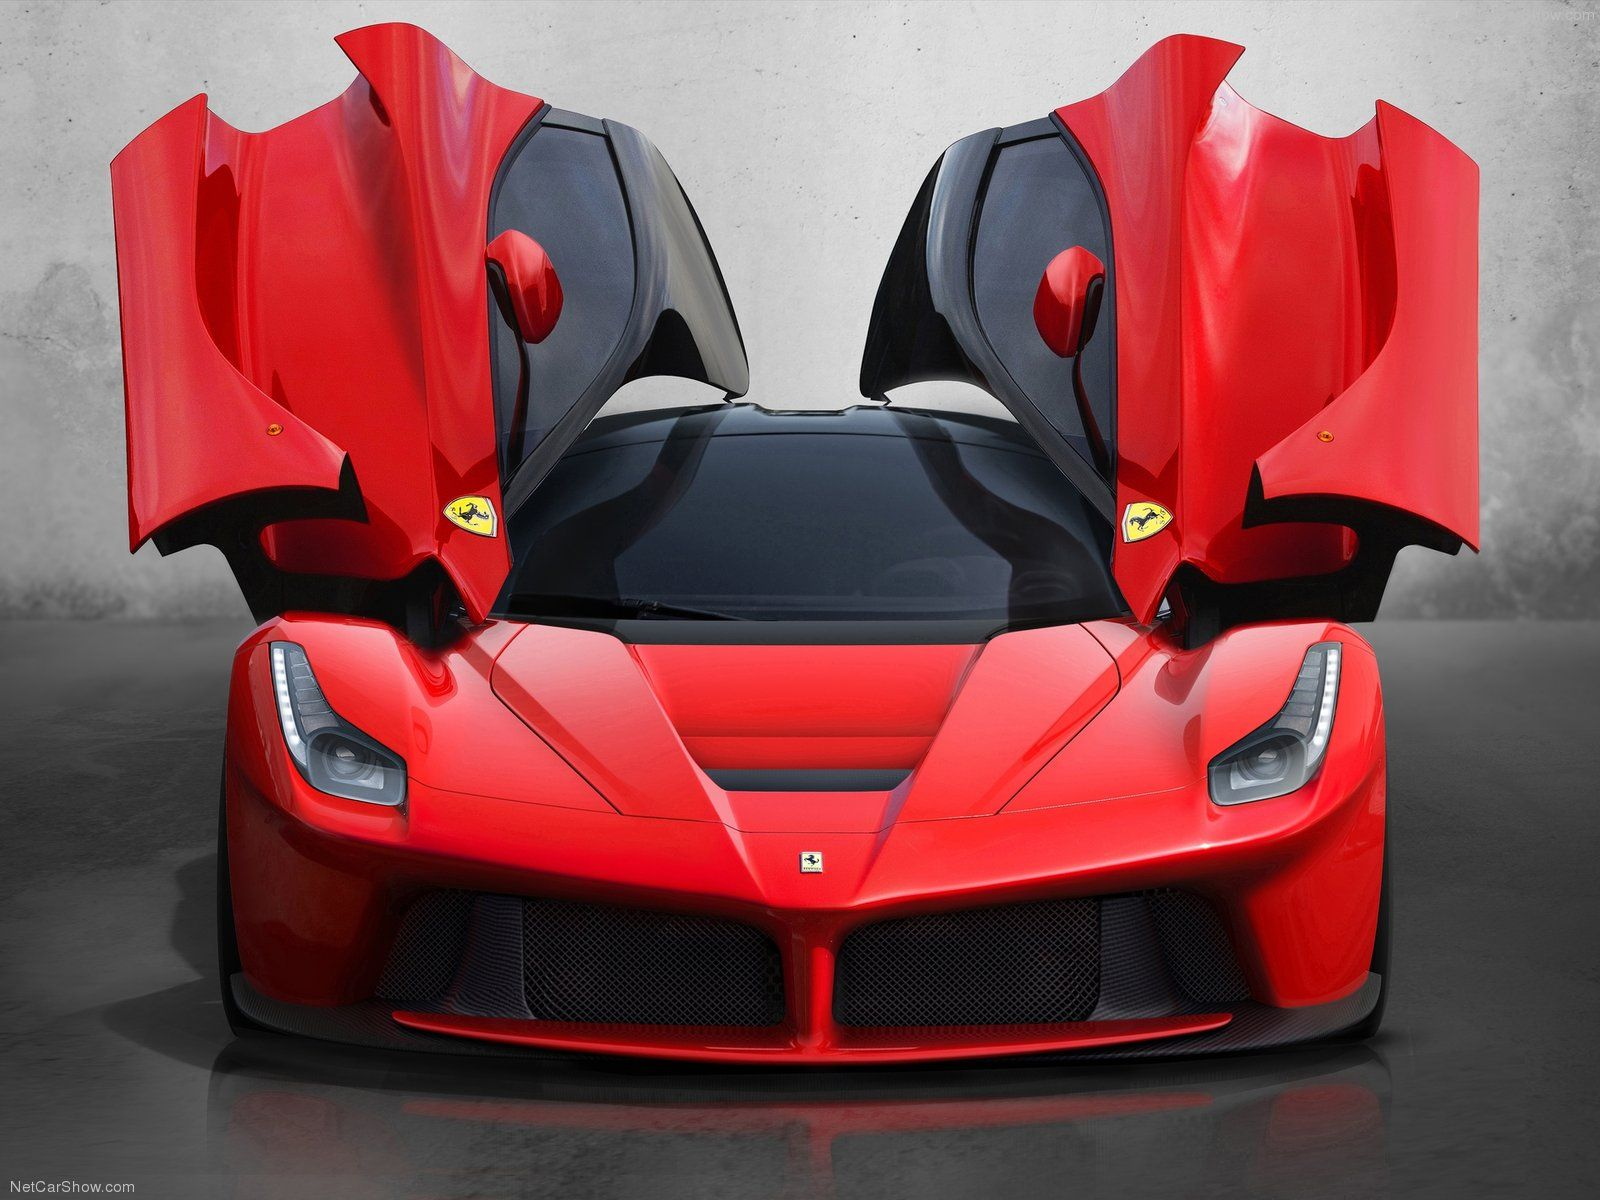 Charming Ferrari LaFerrari 2014 Background HD Wallpaper